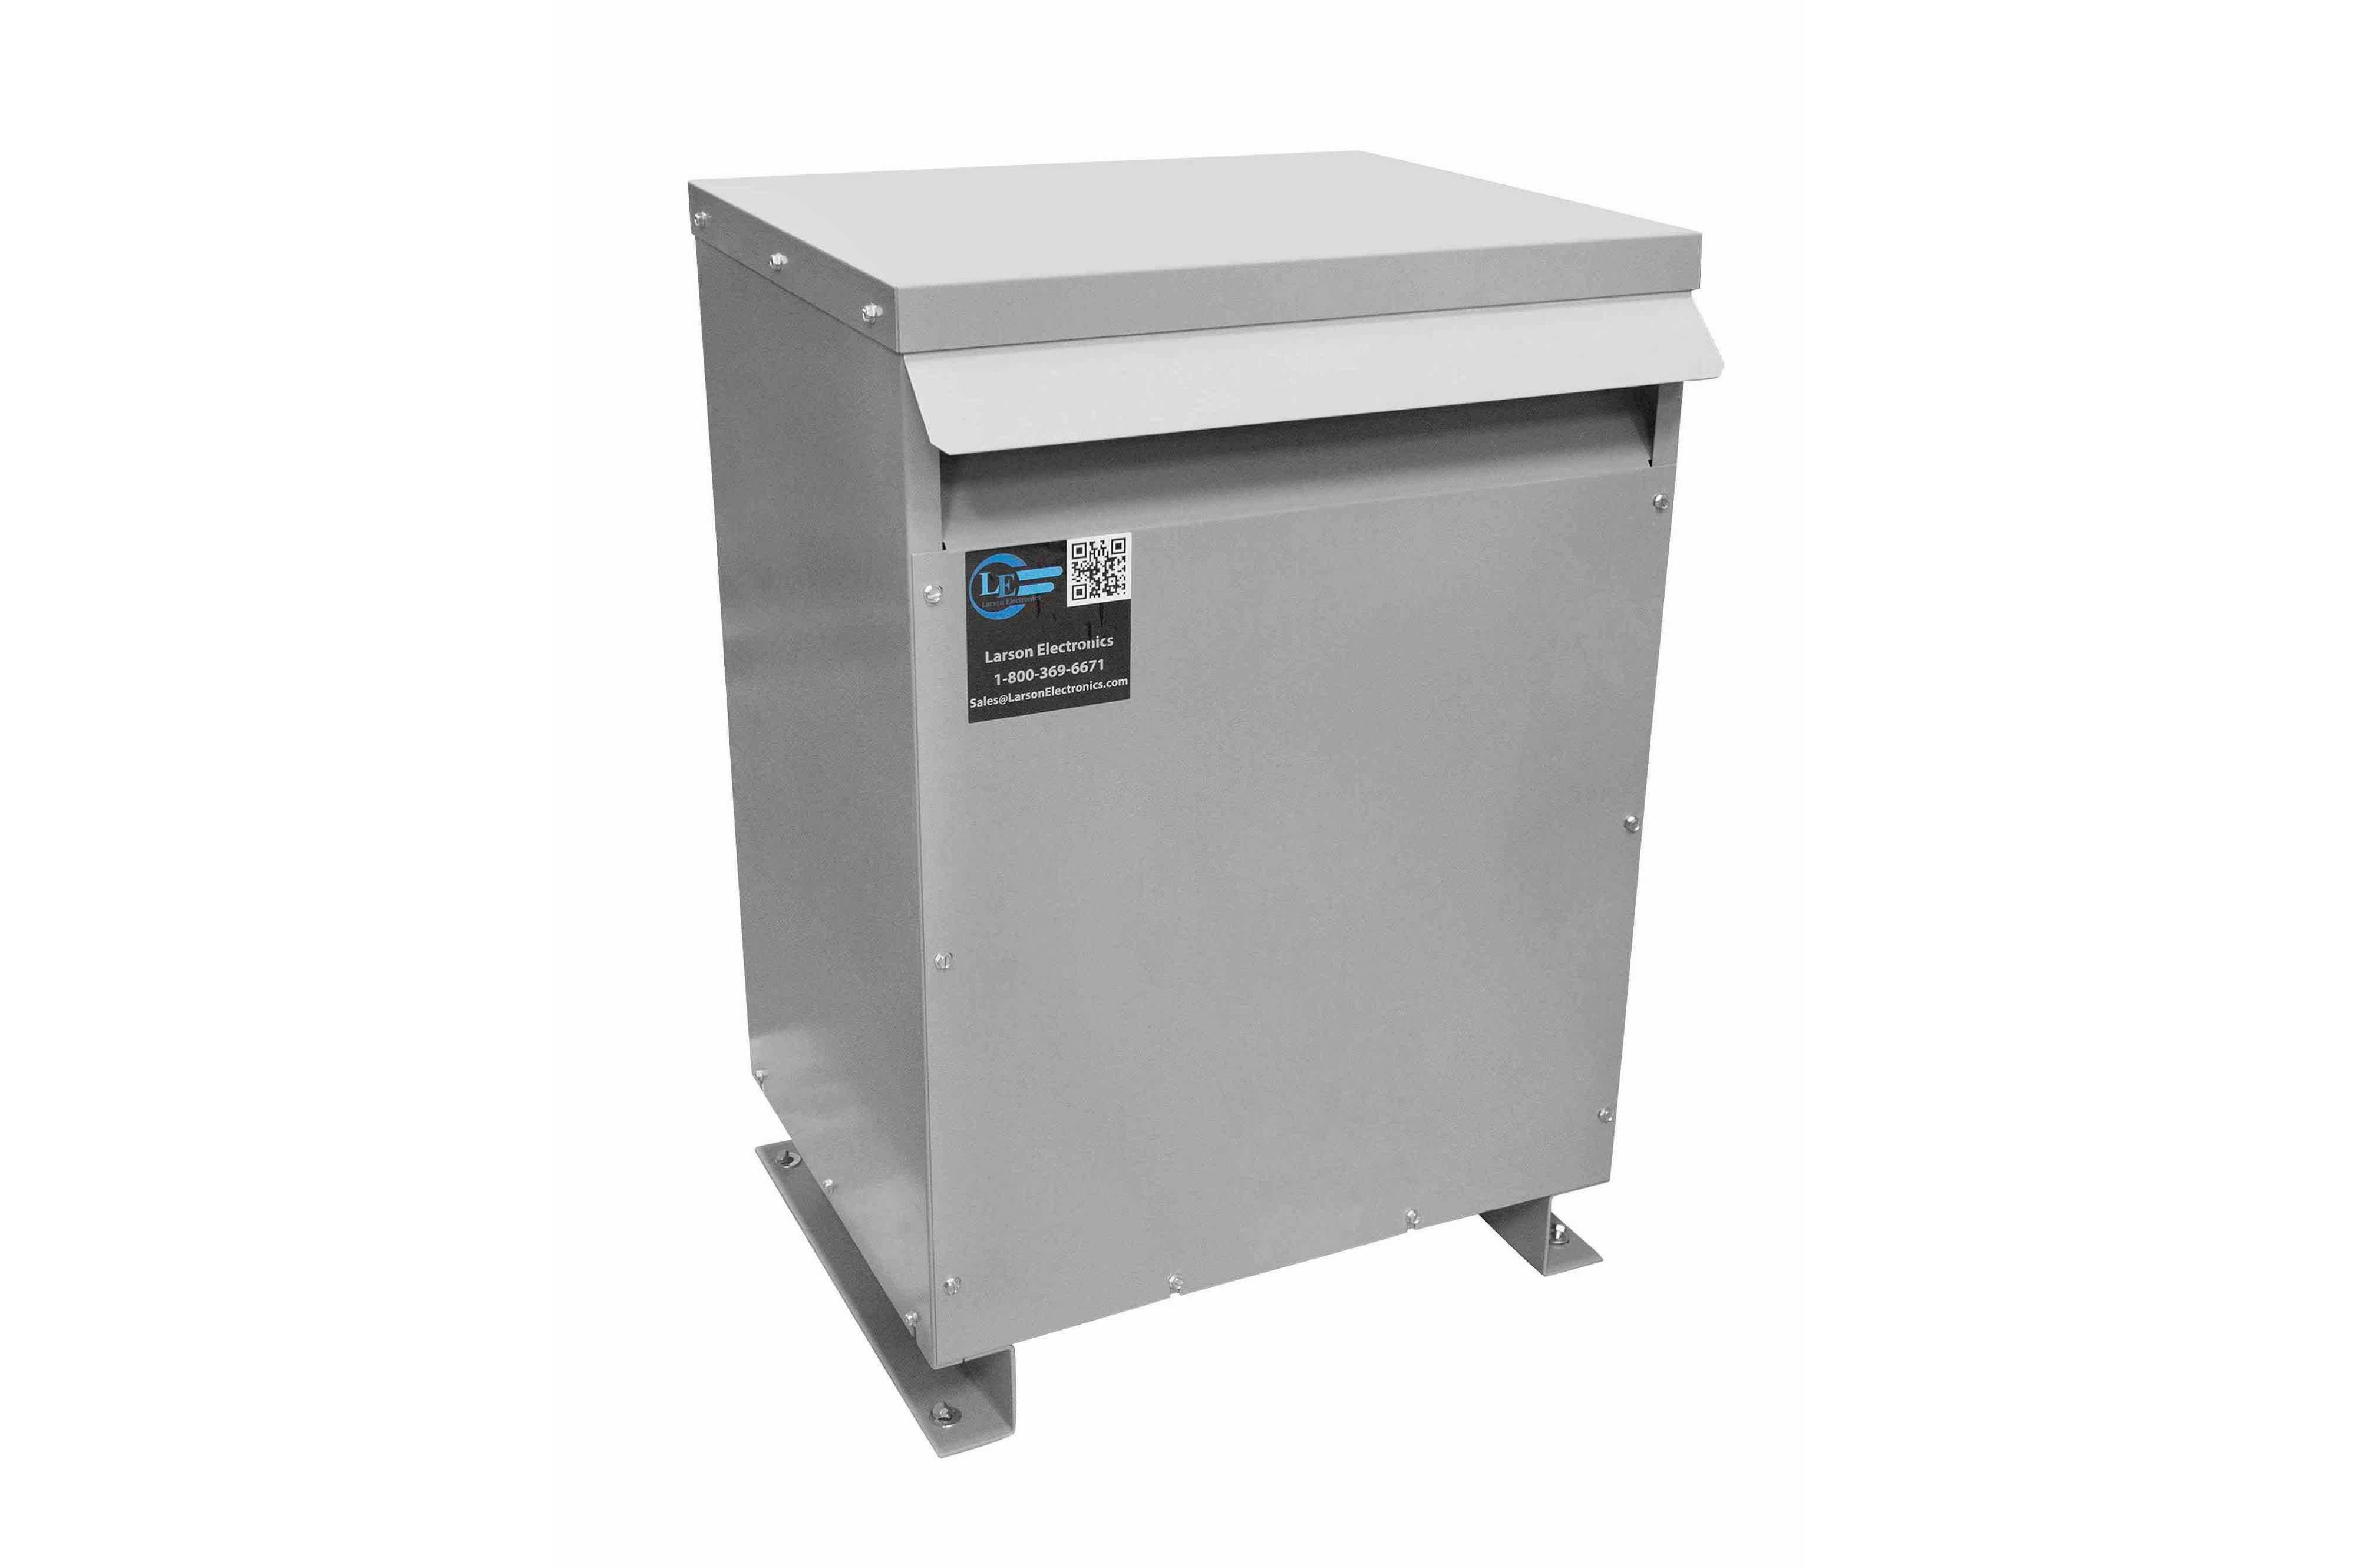 225 kVA 3PH Isolation Transformer, 575V Wye Primary, 400Y/231 Wye-N Secondary, N3R, Ventilated, 60 Hz